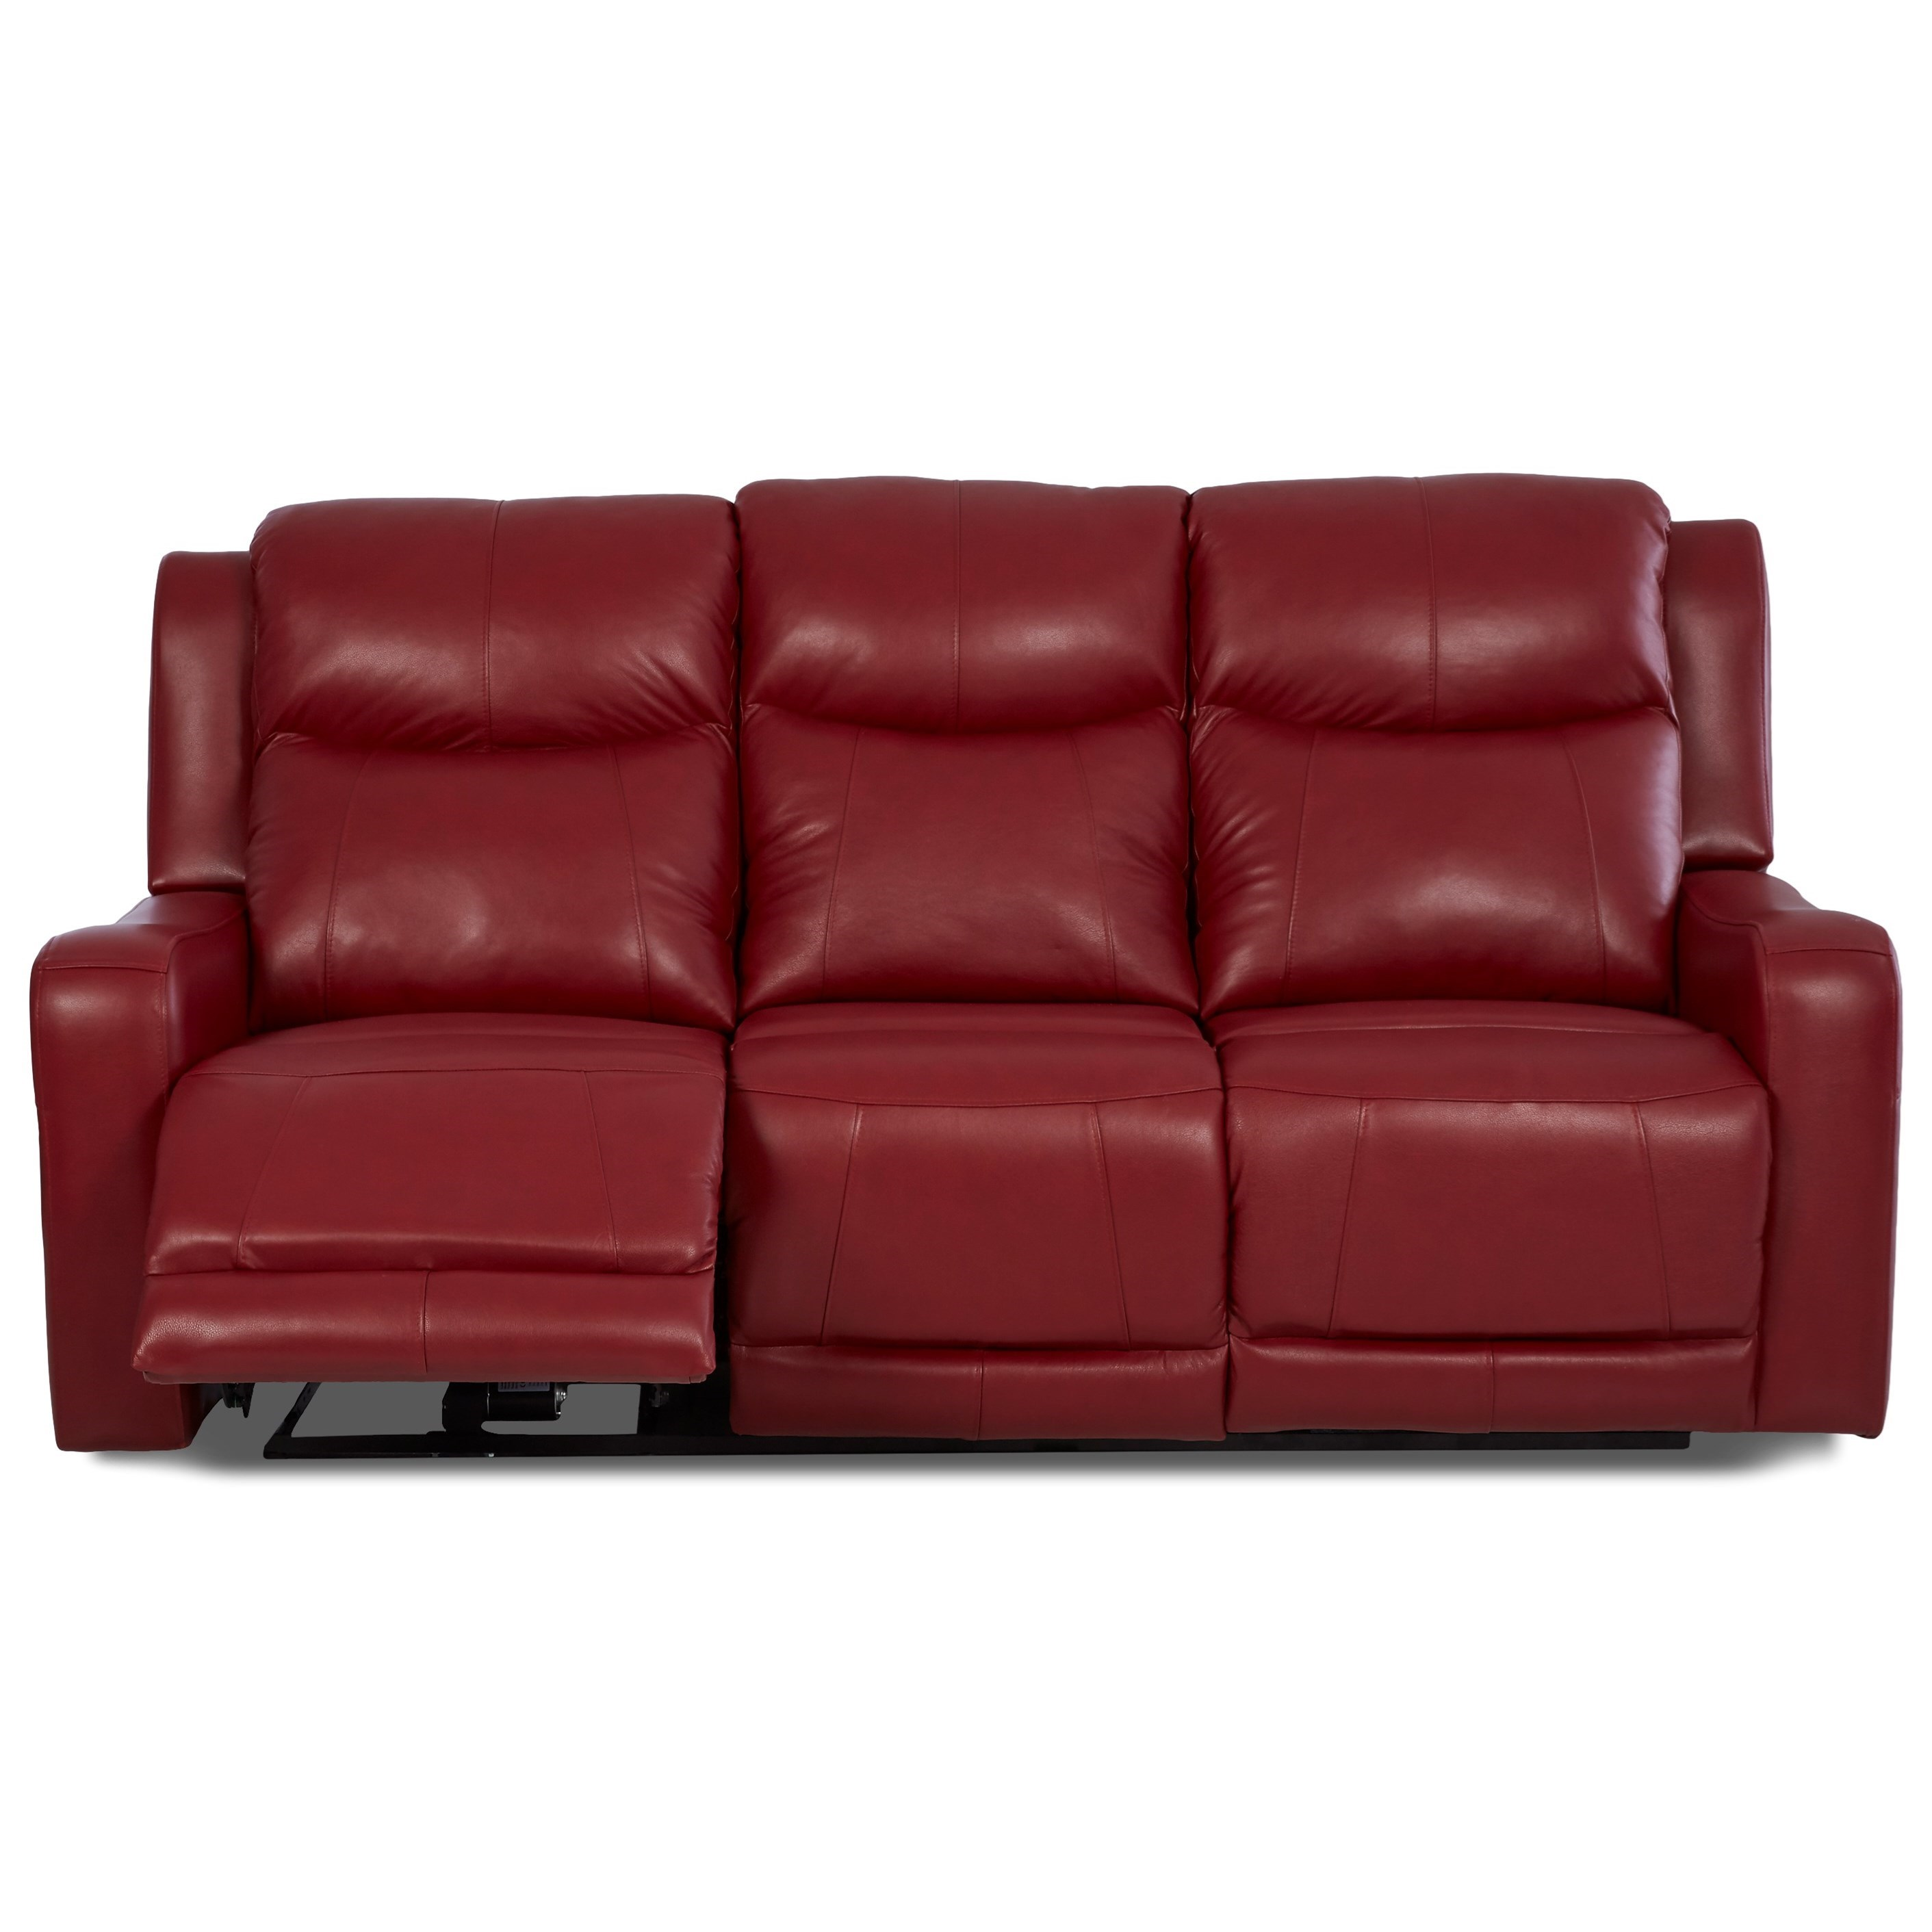 two cushion power reclining sofa scandinavian murah klaussner barnett lv74803 6 pwrs with